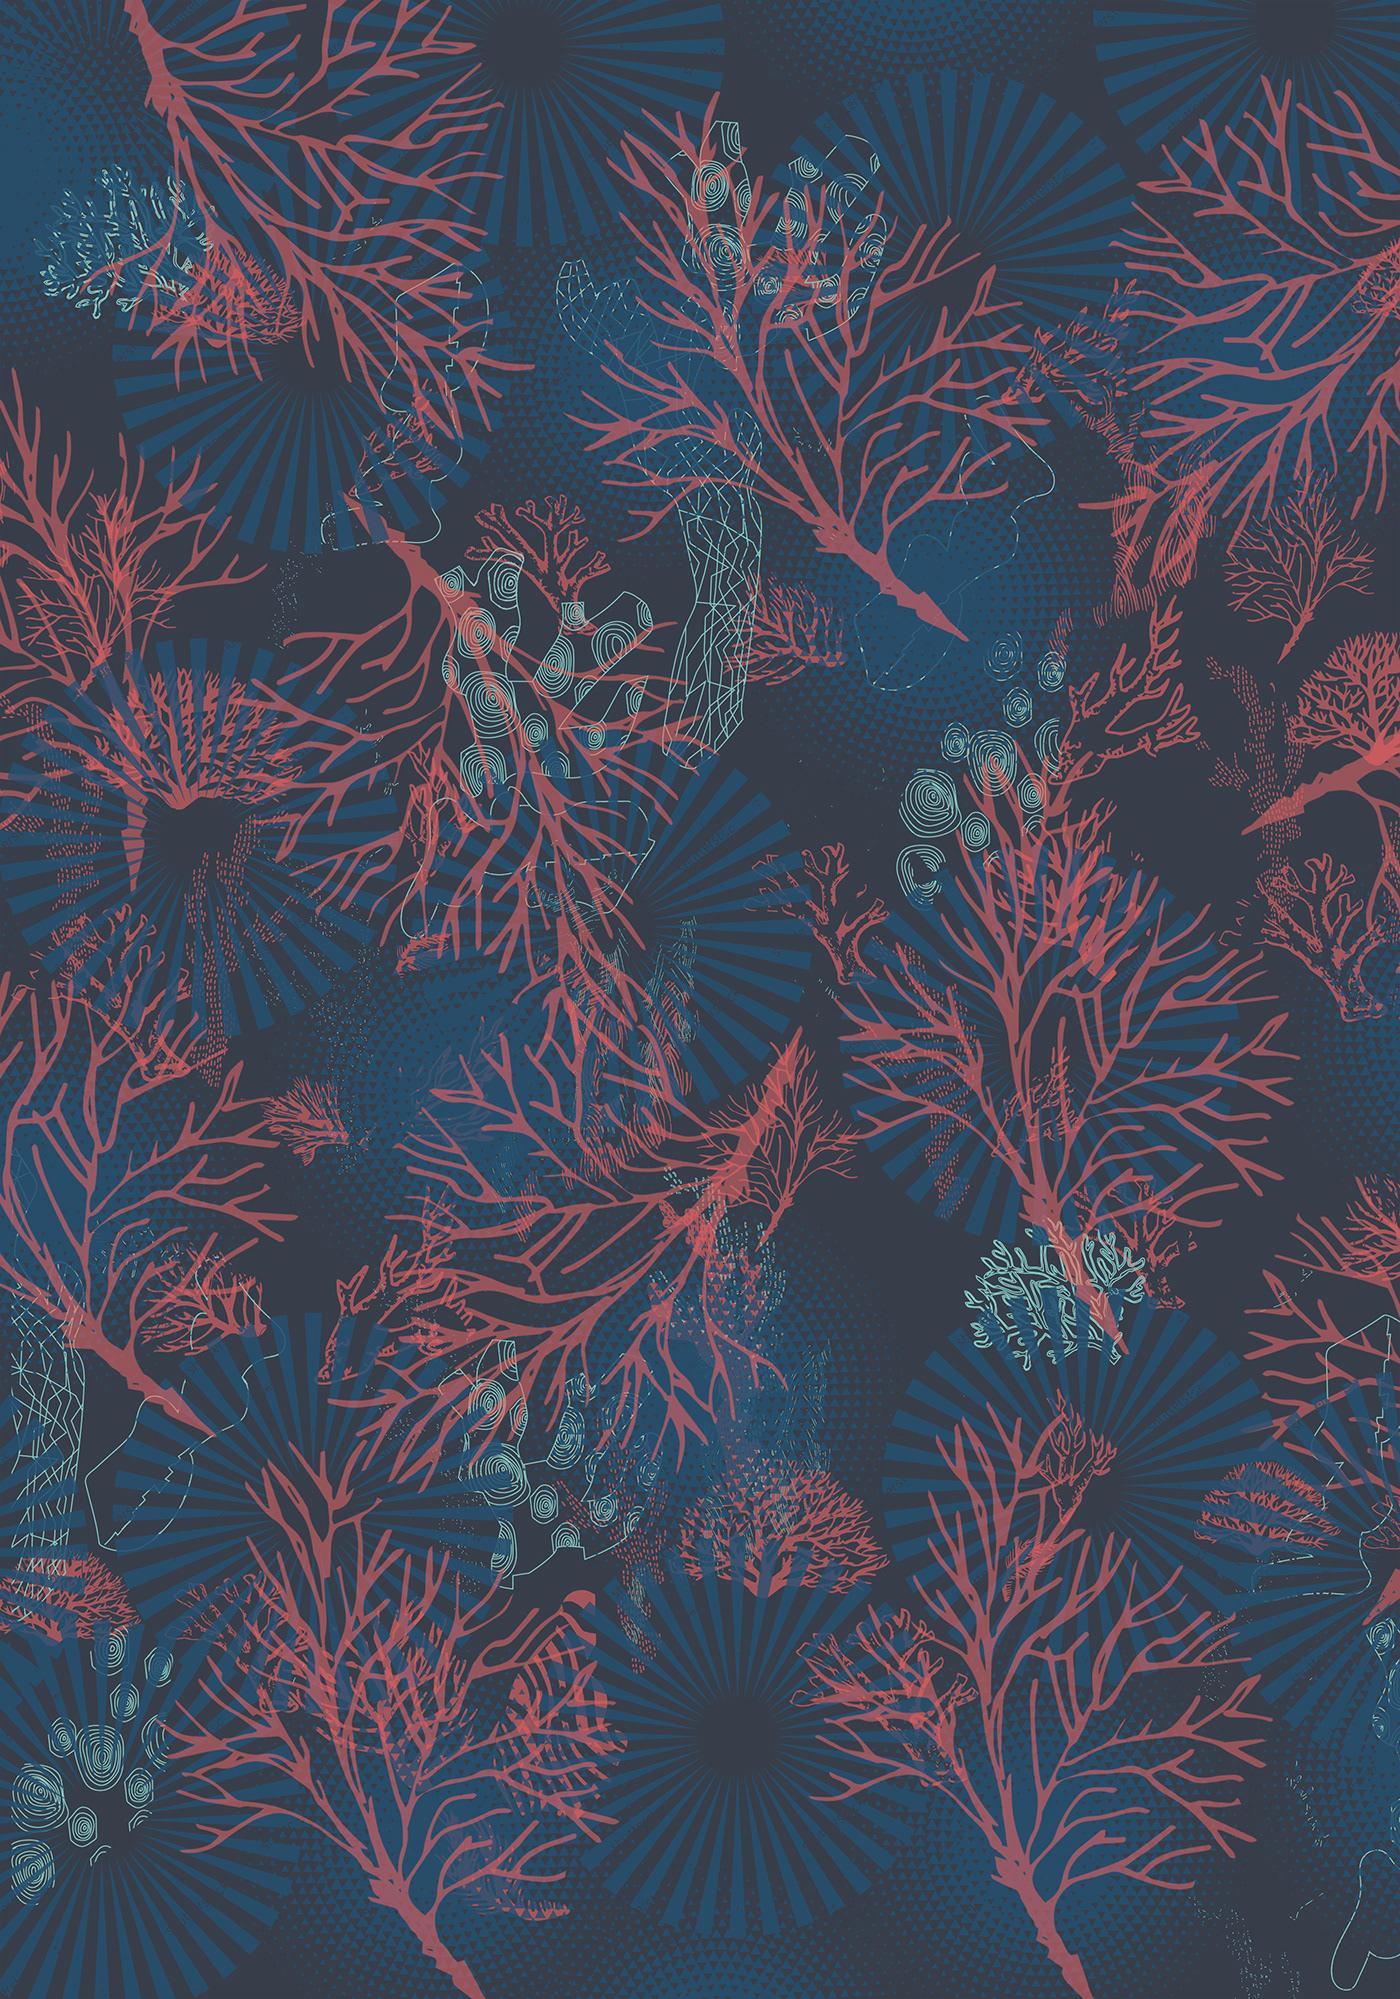 corals prints Fashion  hawaiian prints Menswear ss20 prints summer prints swimwear Tropical Prints